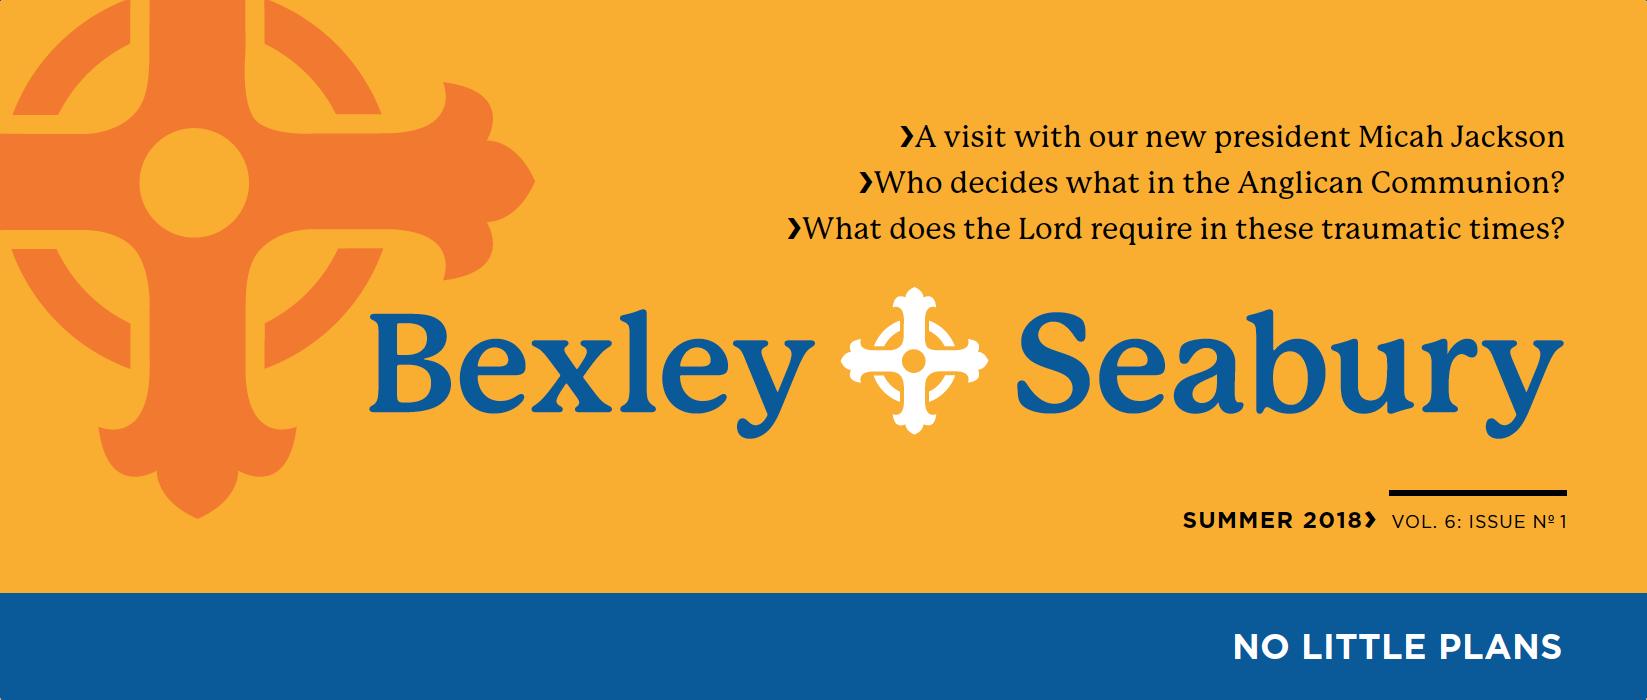 Bexley Seabury 2018 Magazine